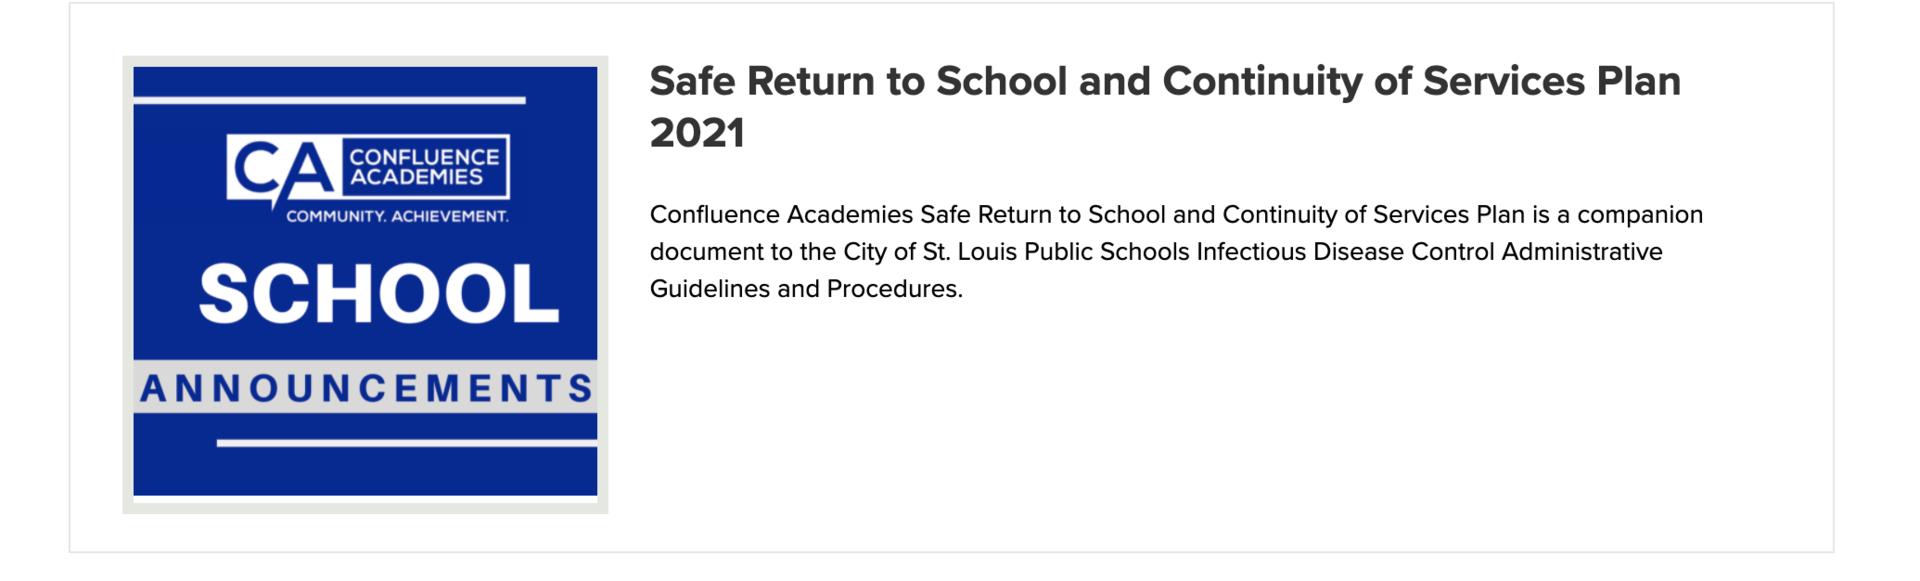 School Safety Procedures Confluence Academies